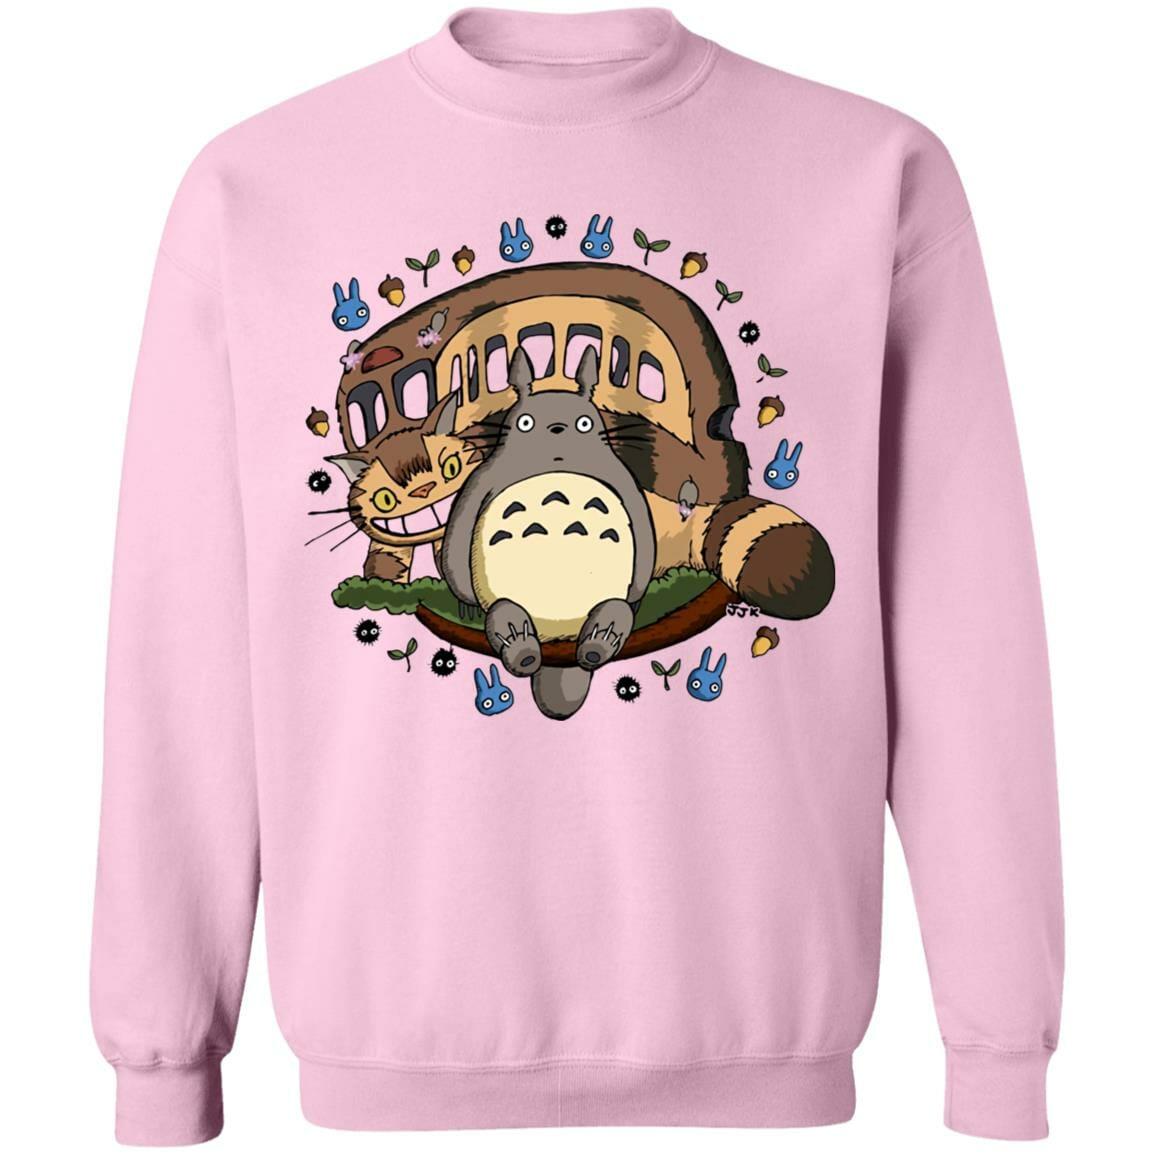 Totoro and the Catbus Sweatshirt